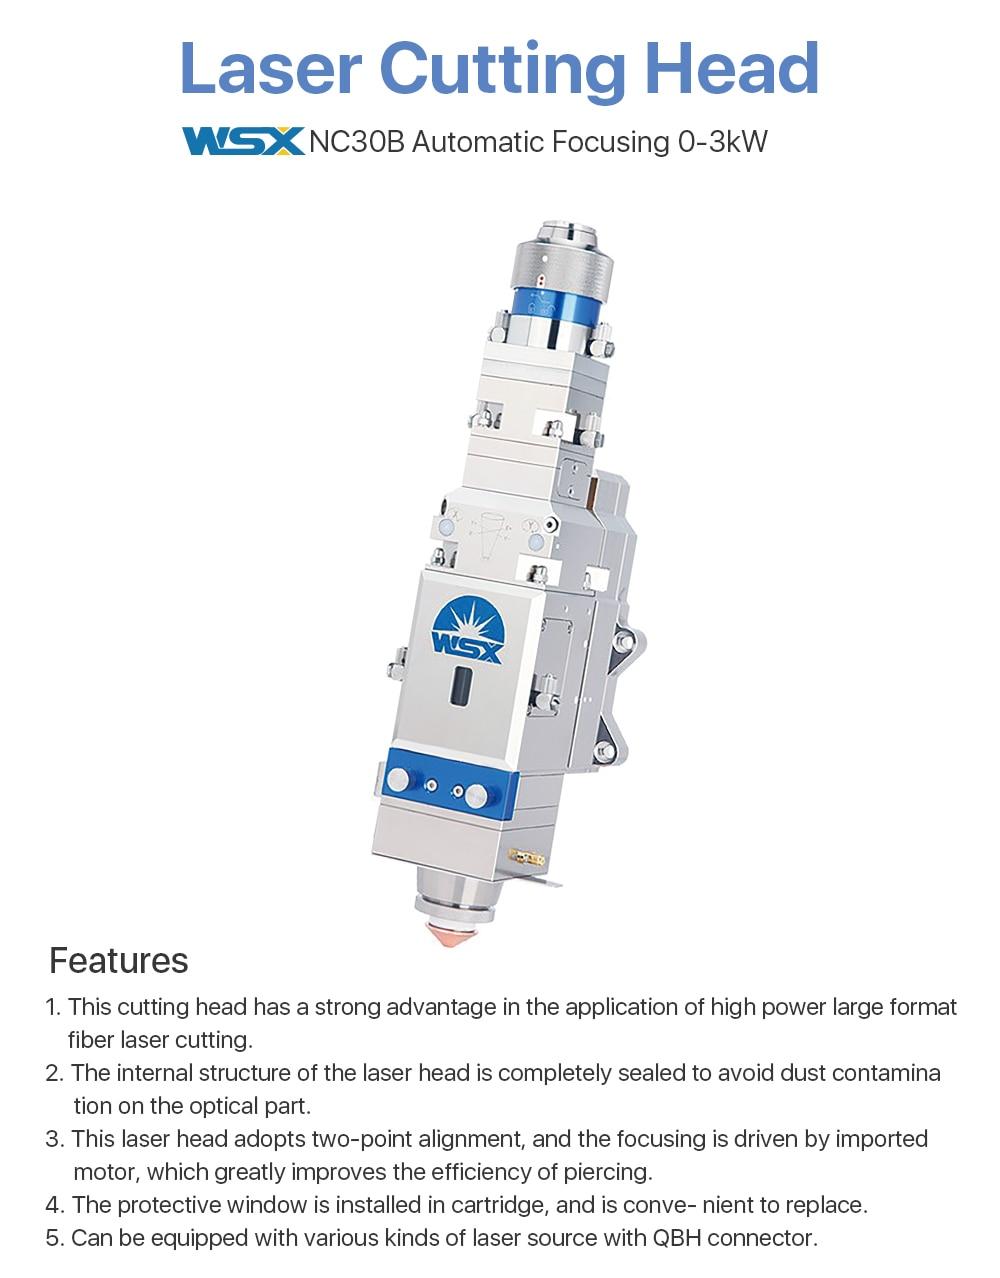 WSX 0-3KW NC30B Fiber Laser Cutting Head Automatic Focusing High Power QBH 3000W for Metal Cutting